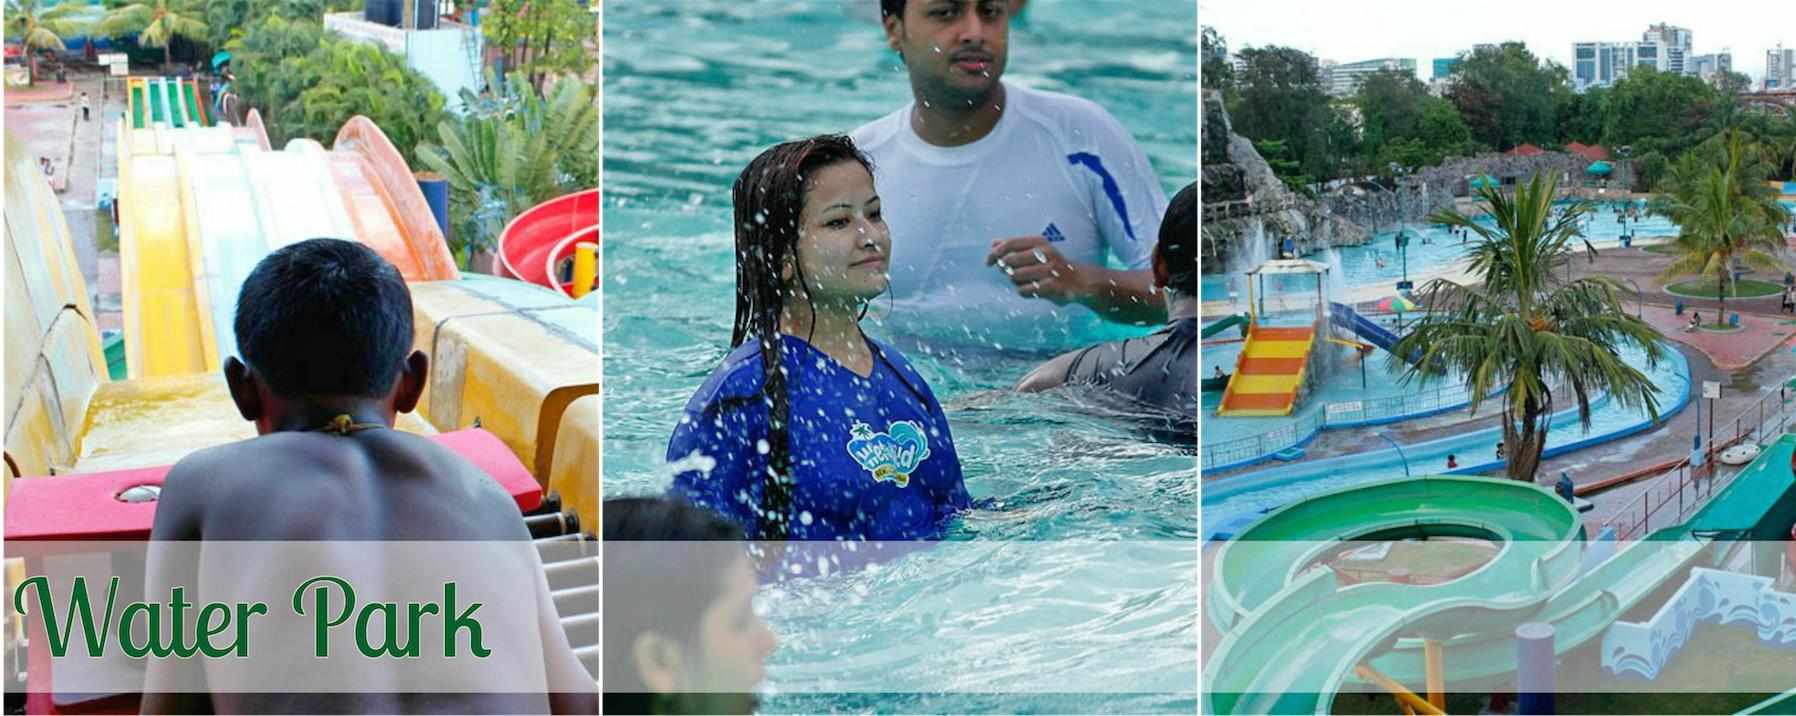 Nicco-waterpark-Kolkata.